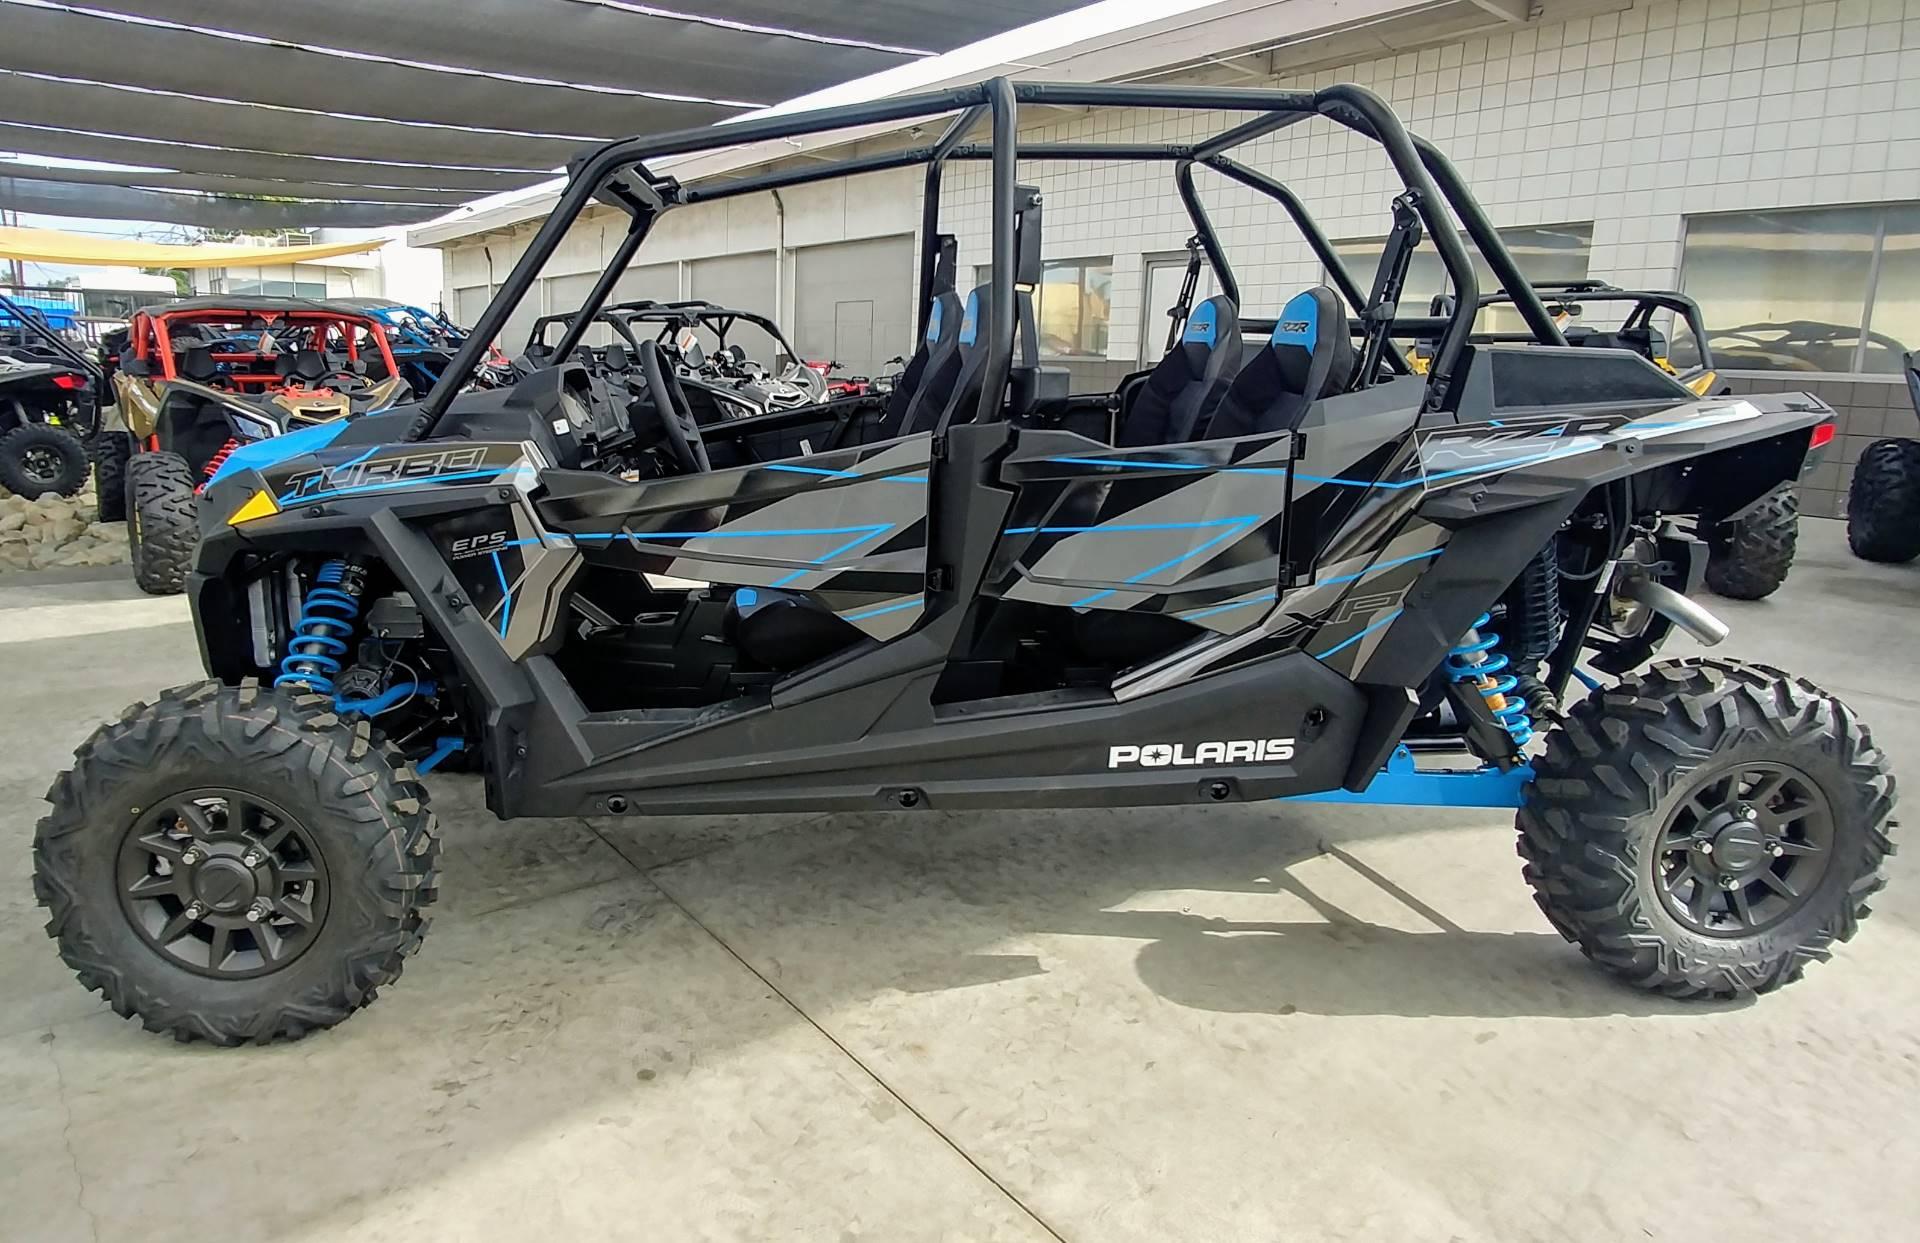 2019 Polaris RZR XP 4 Turbo for sale 8841